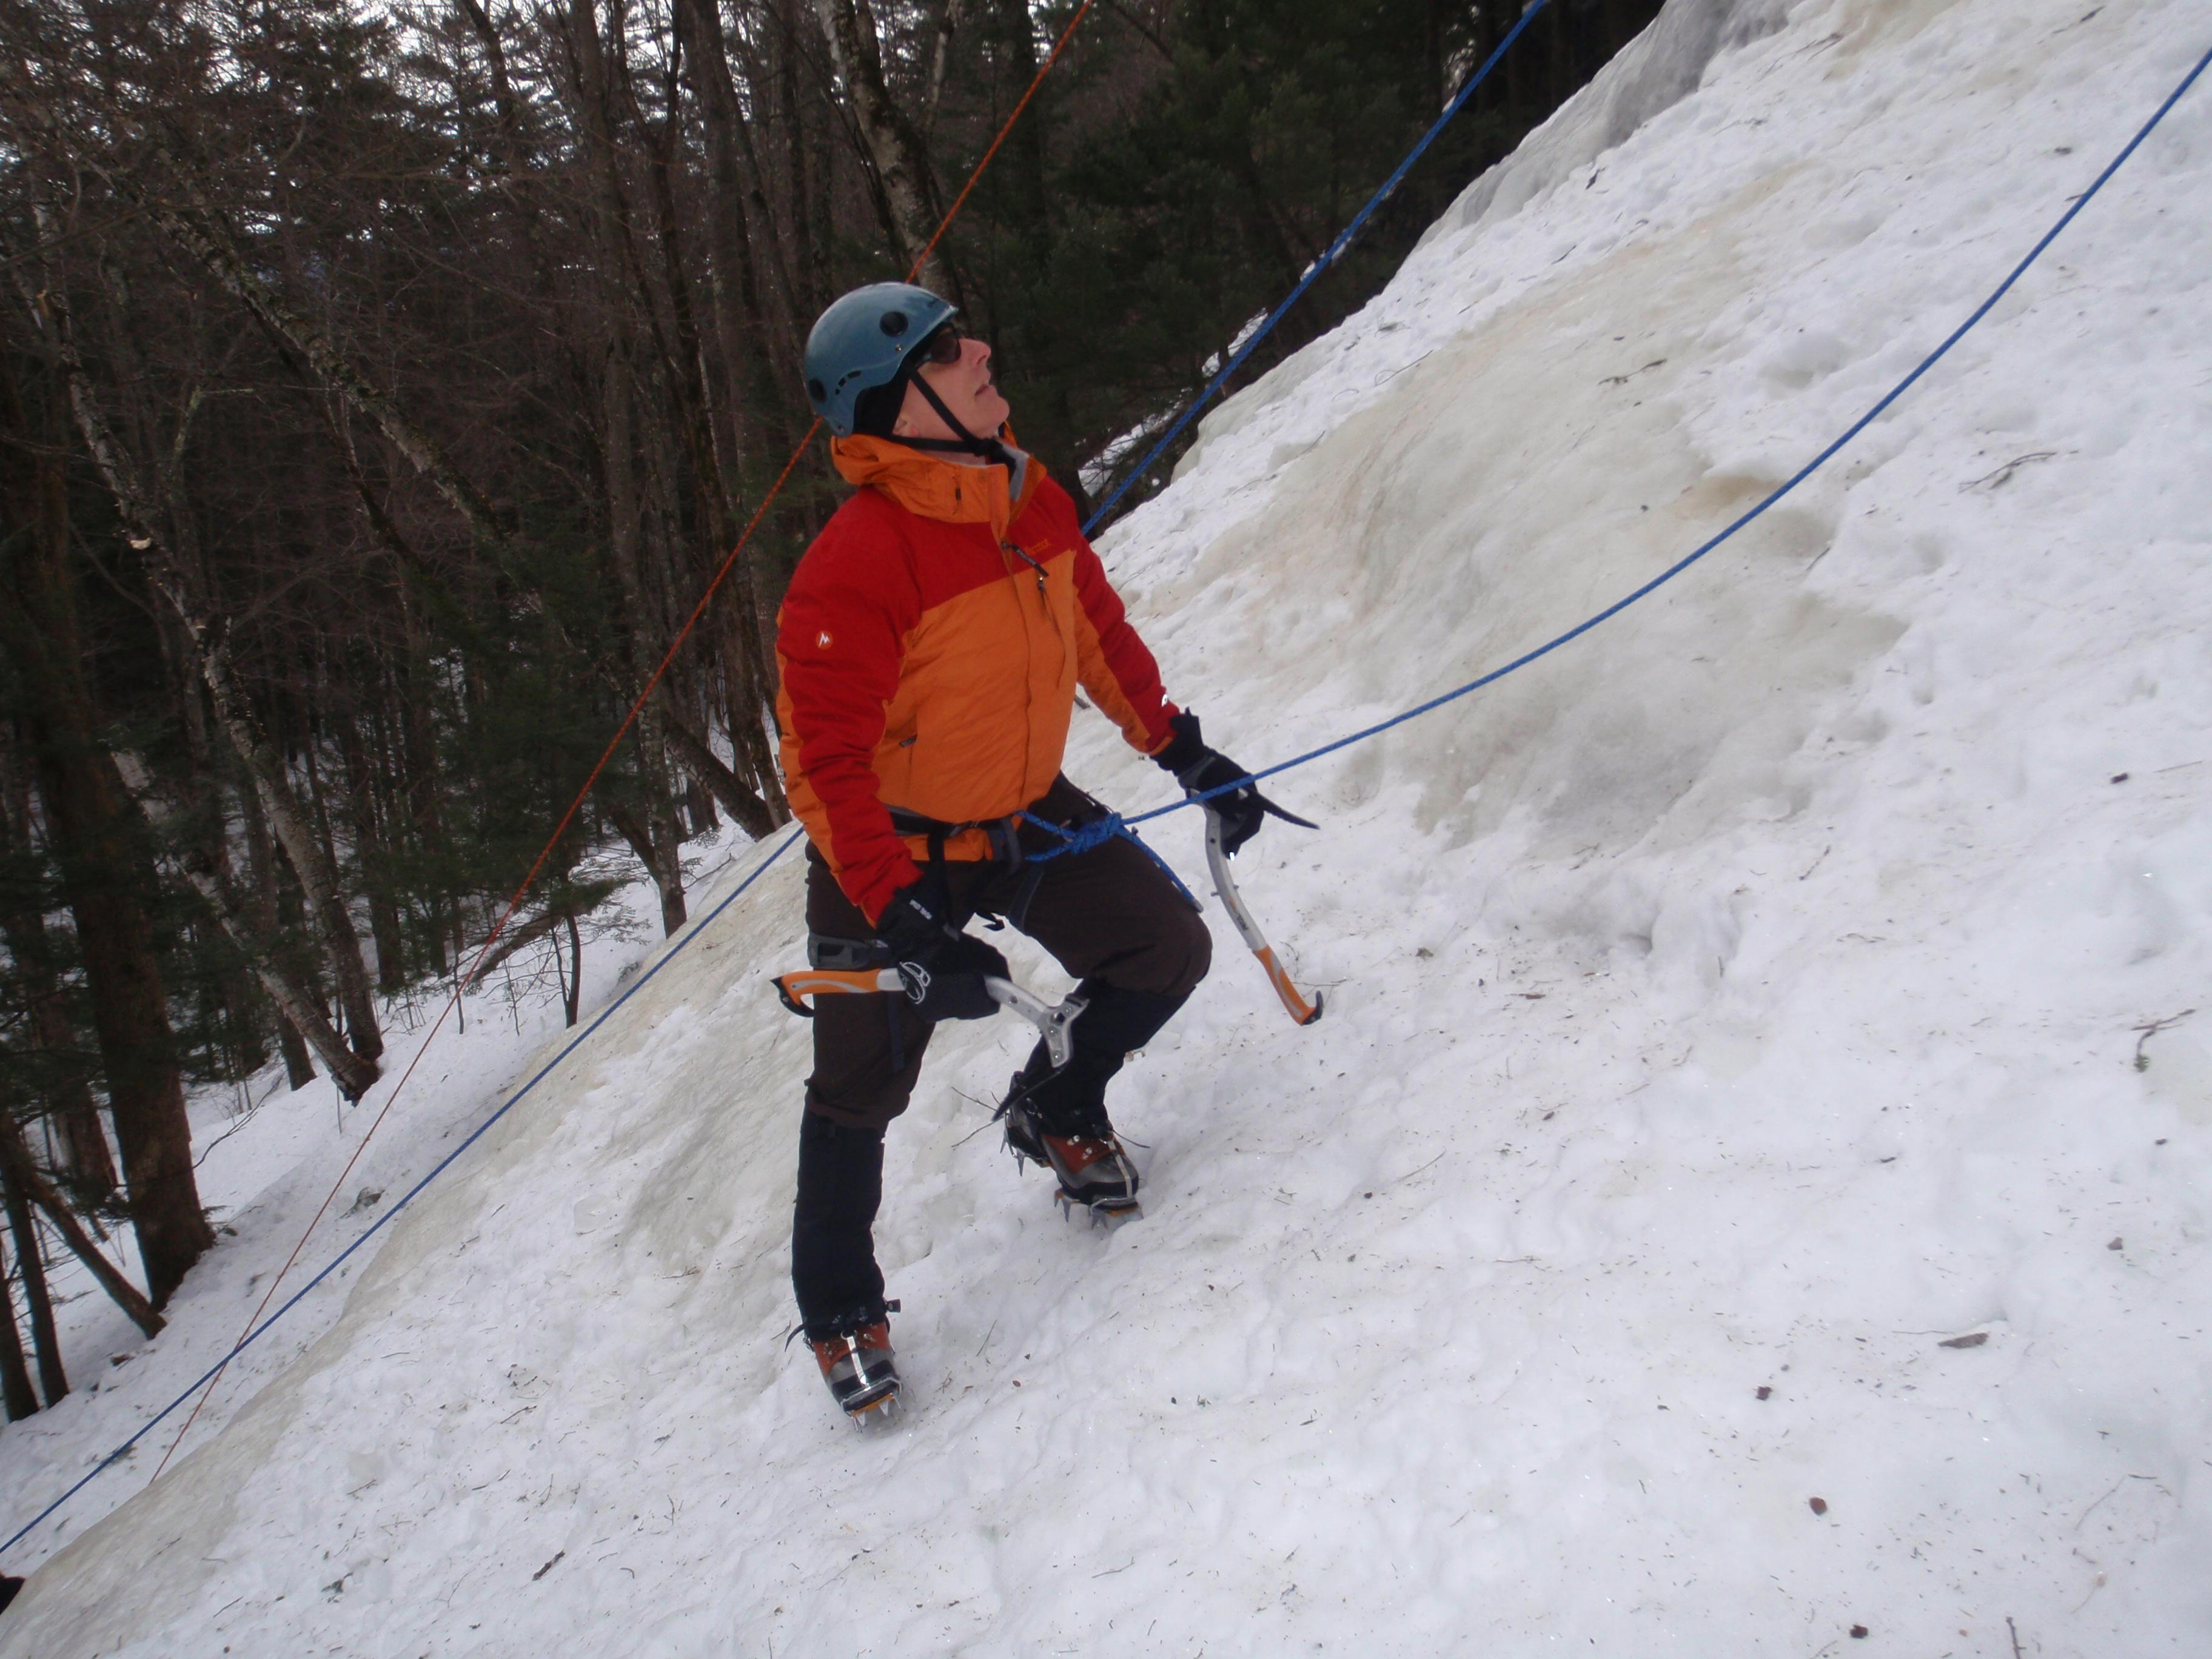 Bob prepares for the steeps...